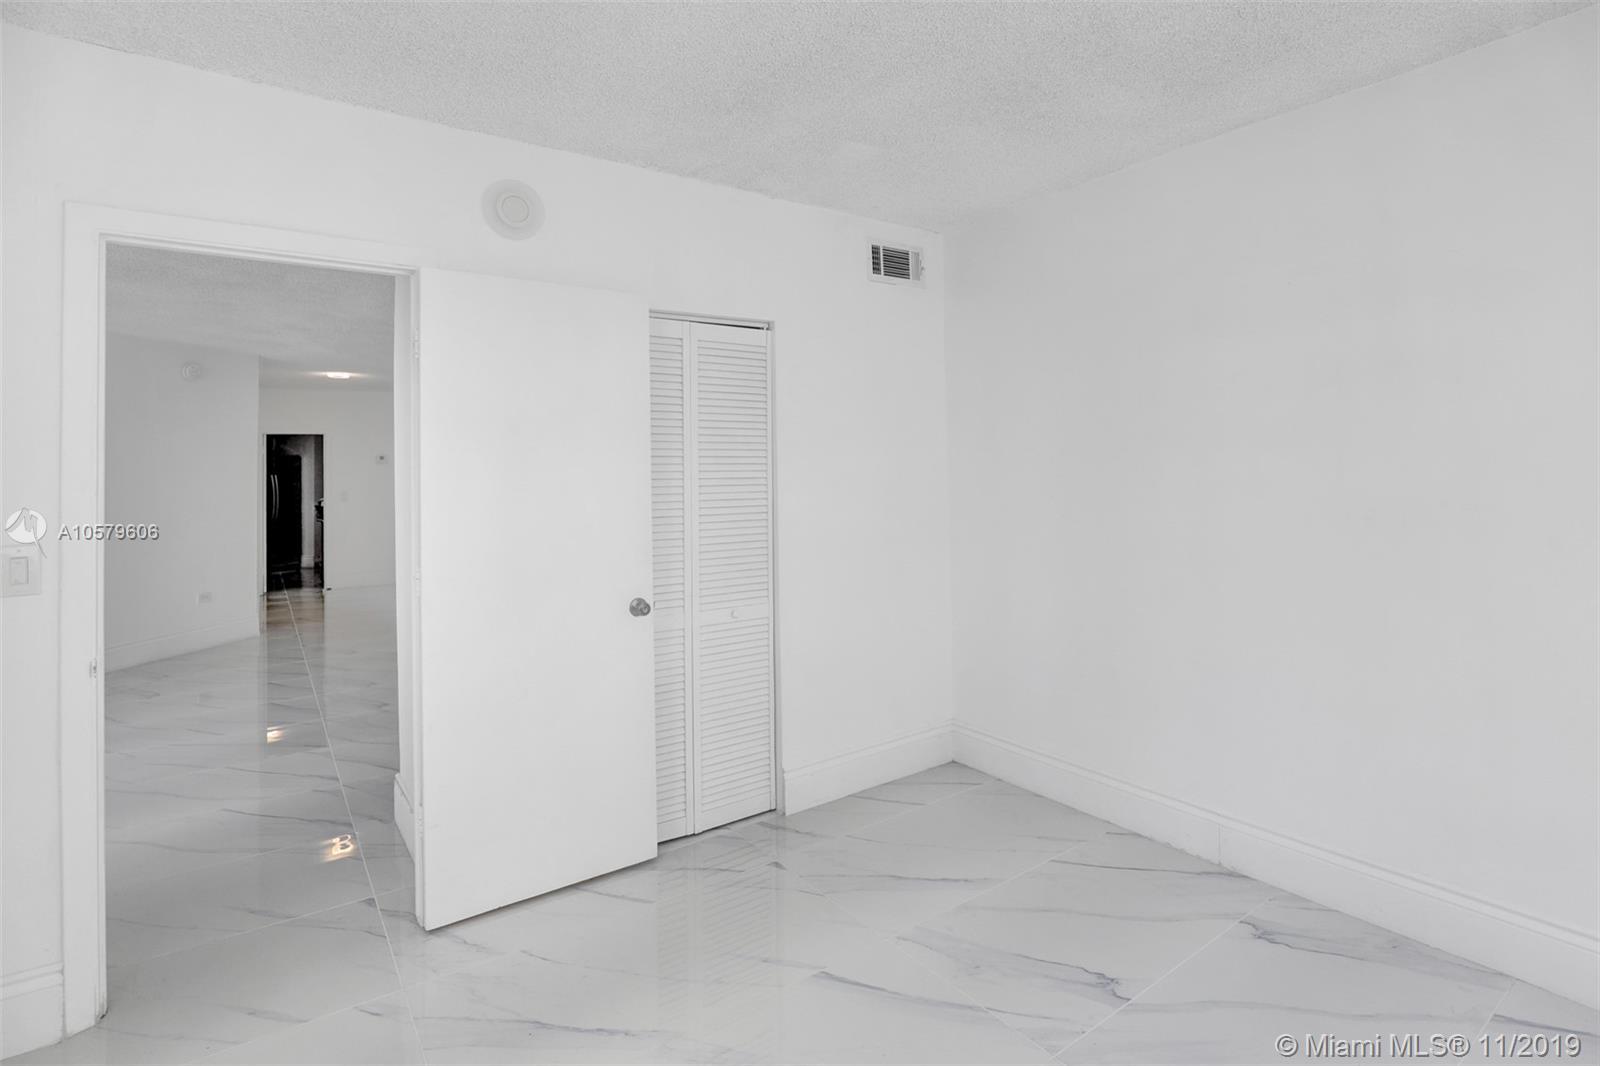 905 Brickell Bay Drive, Miami, FL 33131, Four Ambassadors #1524, Brickell, Miami A10579606 image #13